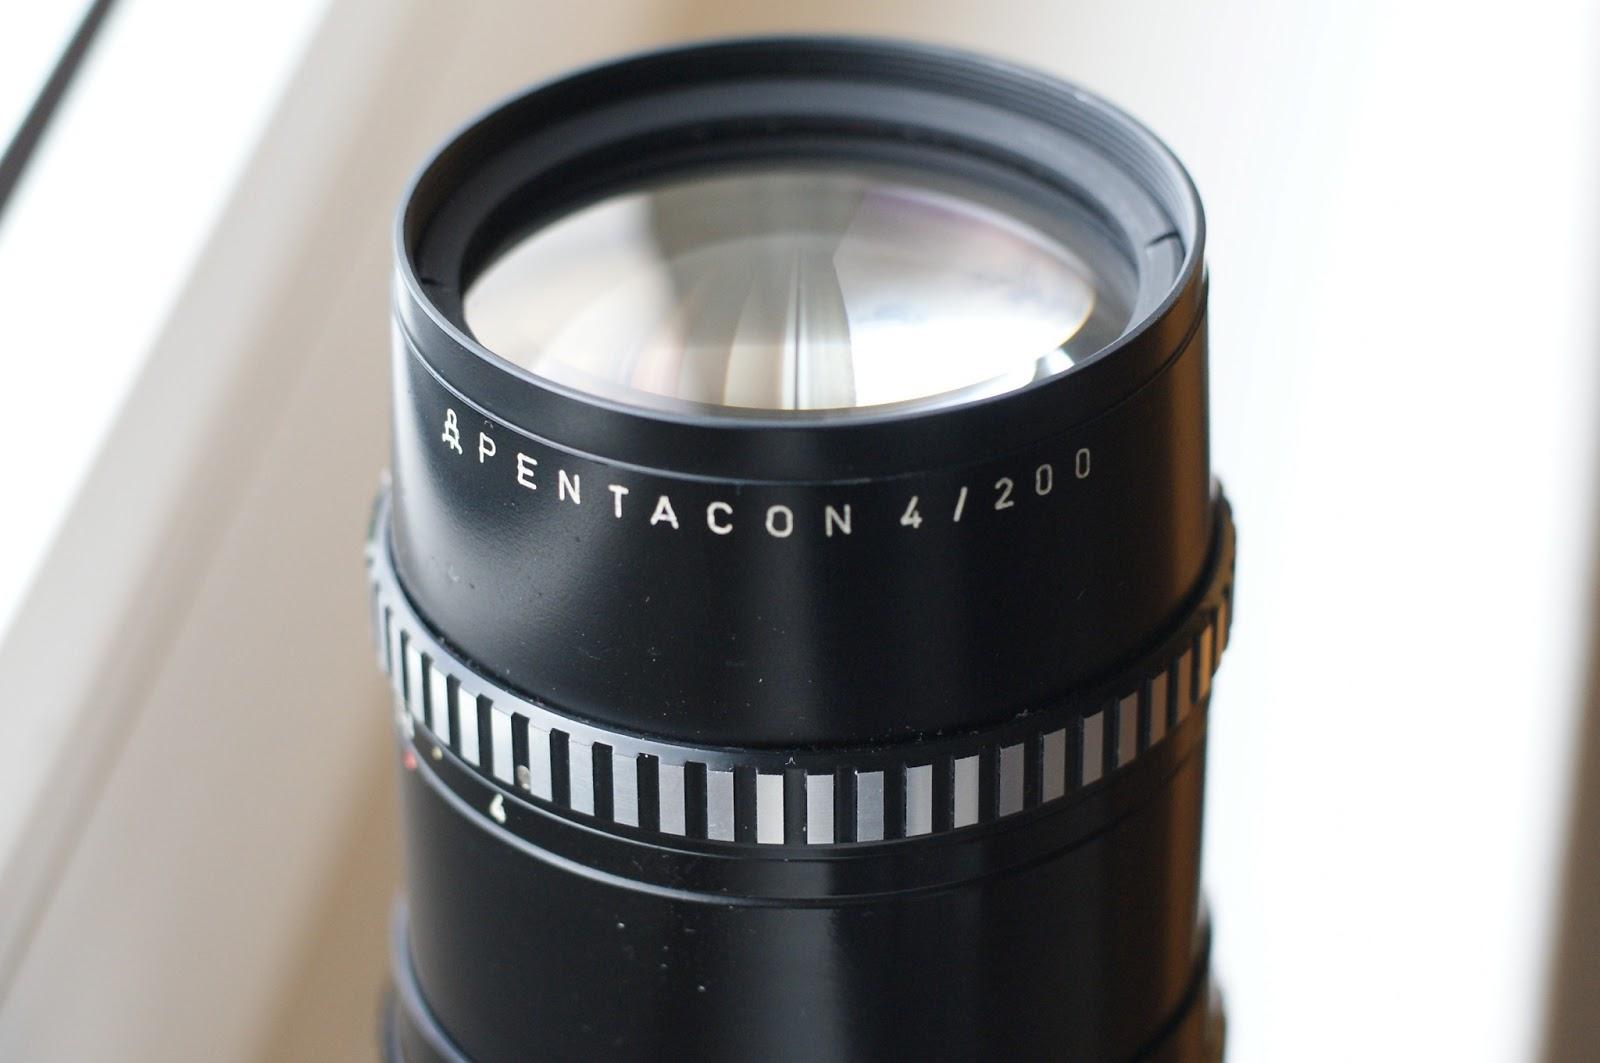 Pentacon 4 / 200